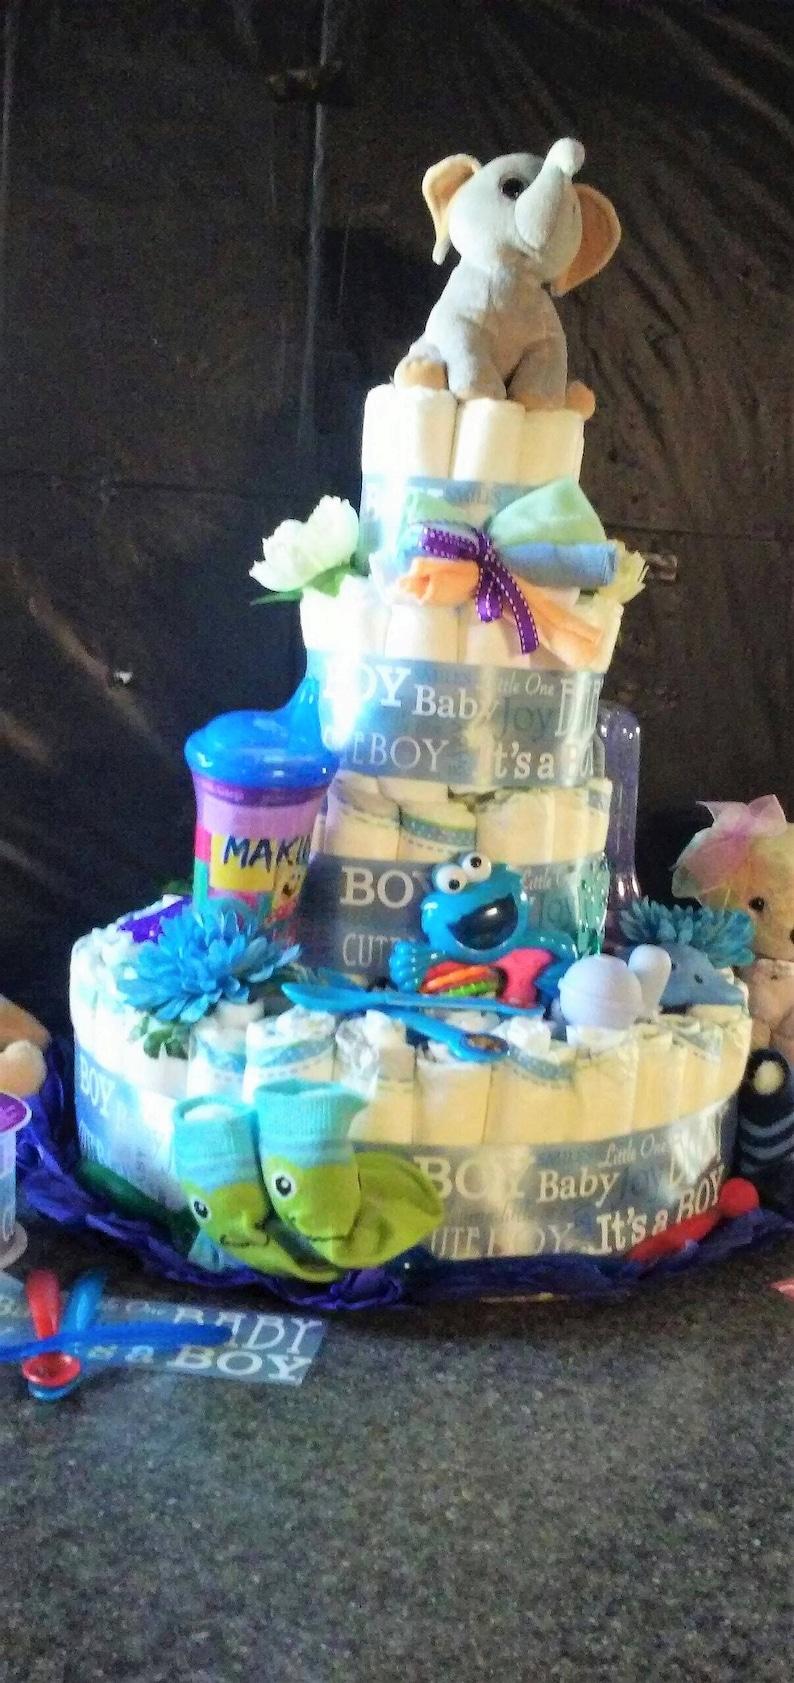 It/'s a Baby BoyFour Tier Diaper CakeForBaby ShowerNewbornNew MomExtra TallExtra LargeTabletopCenterpieceBlue Boy Diaper Cake